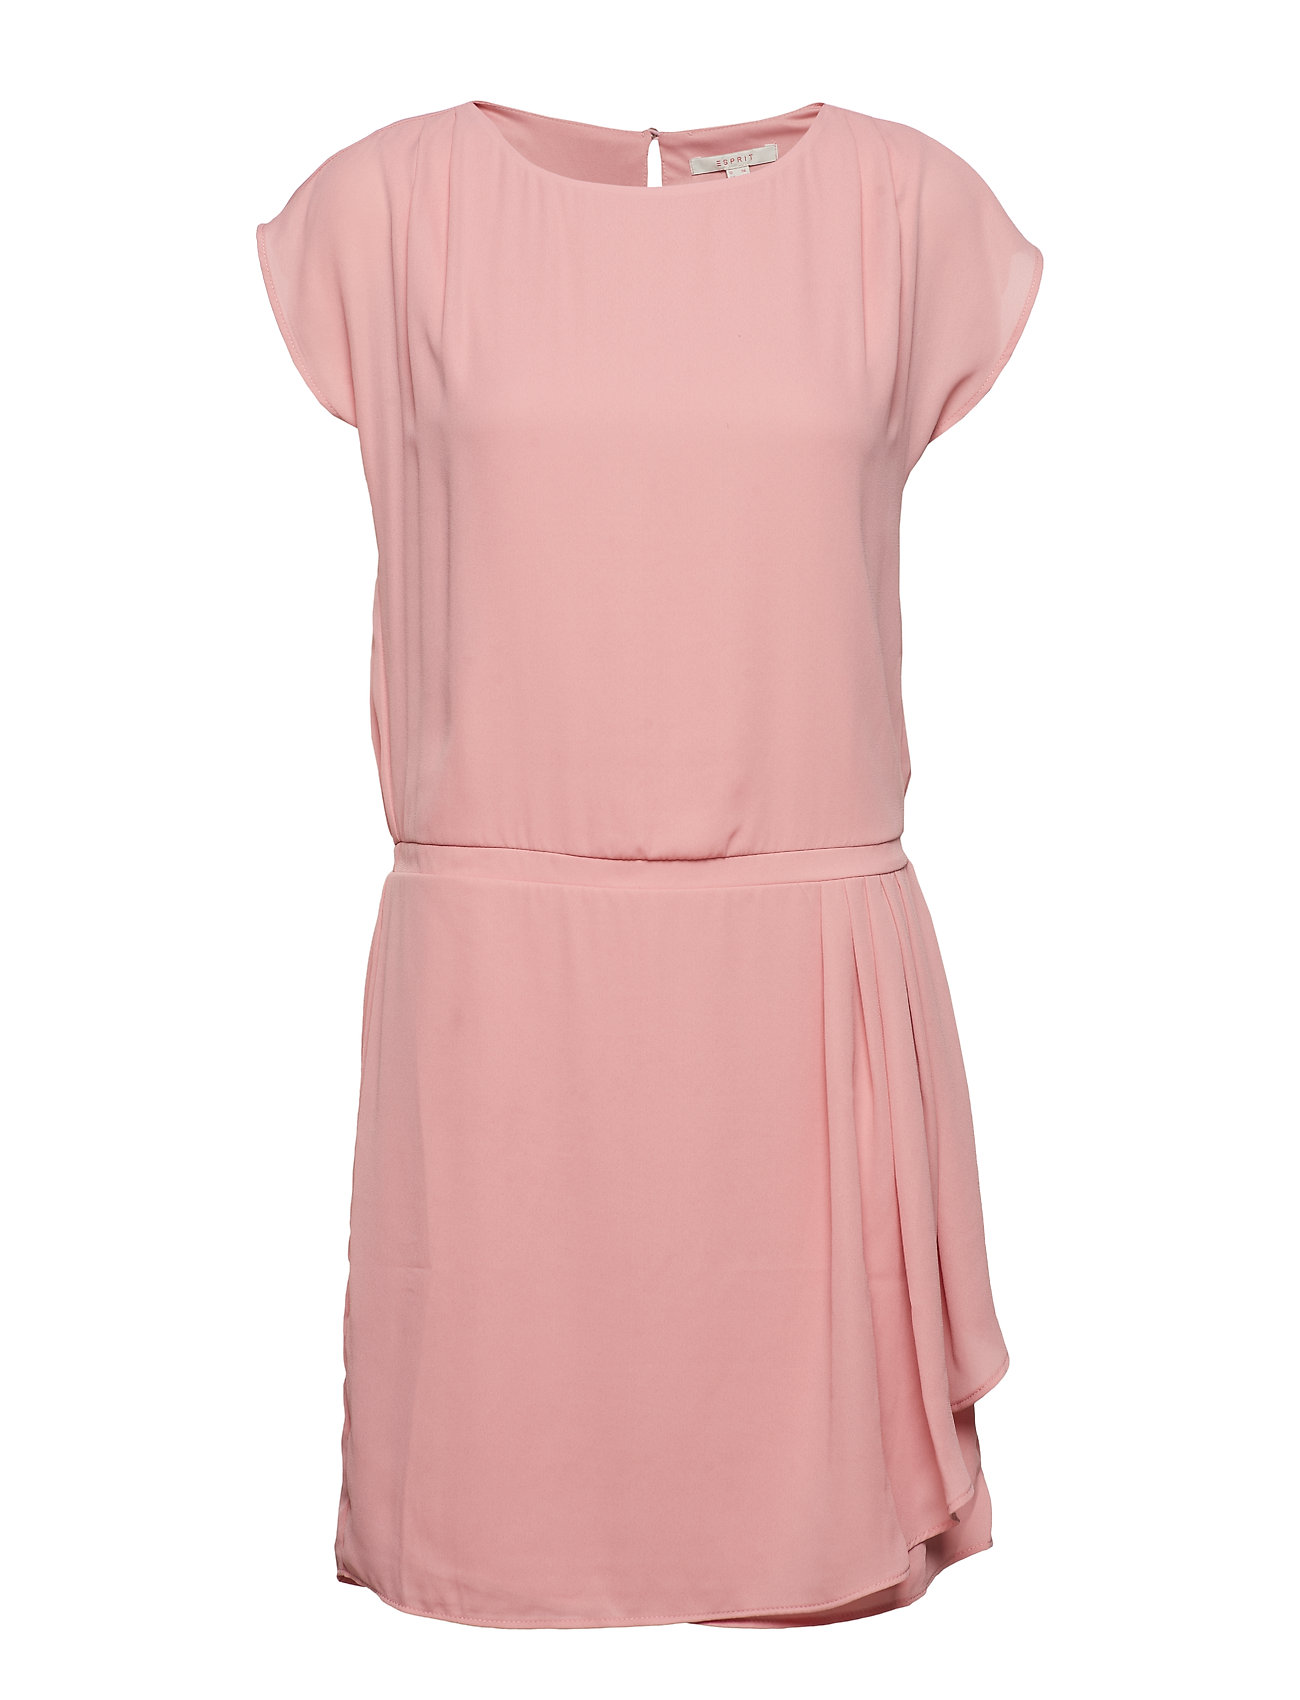 Esprit Casual Dresses light woven - BLUSH